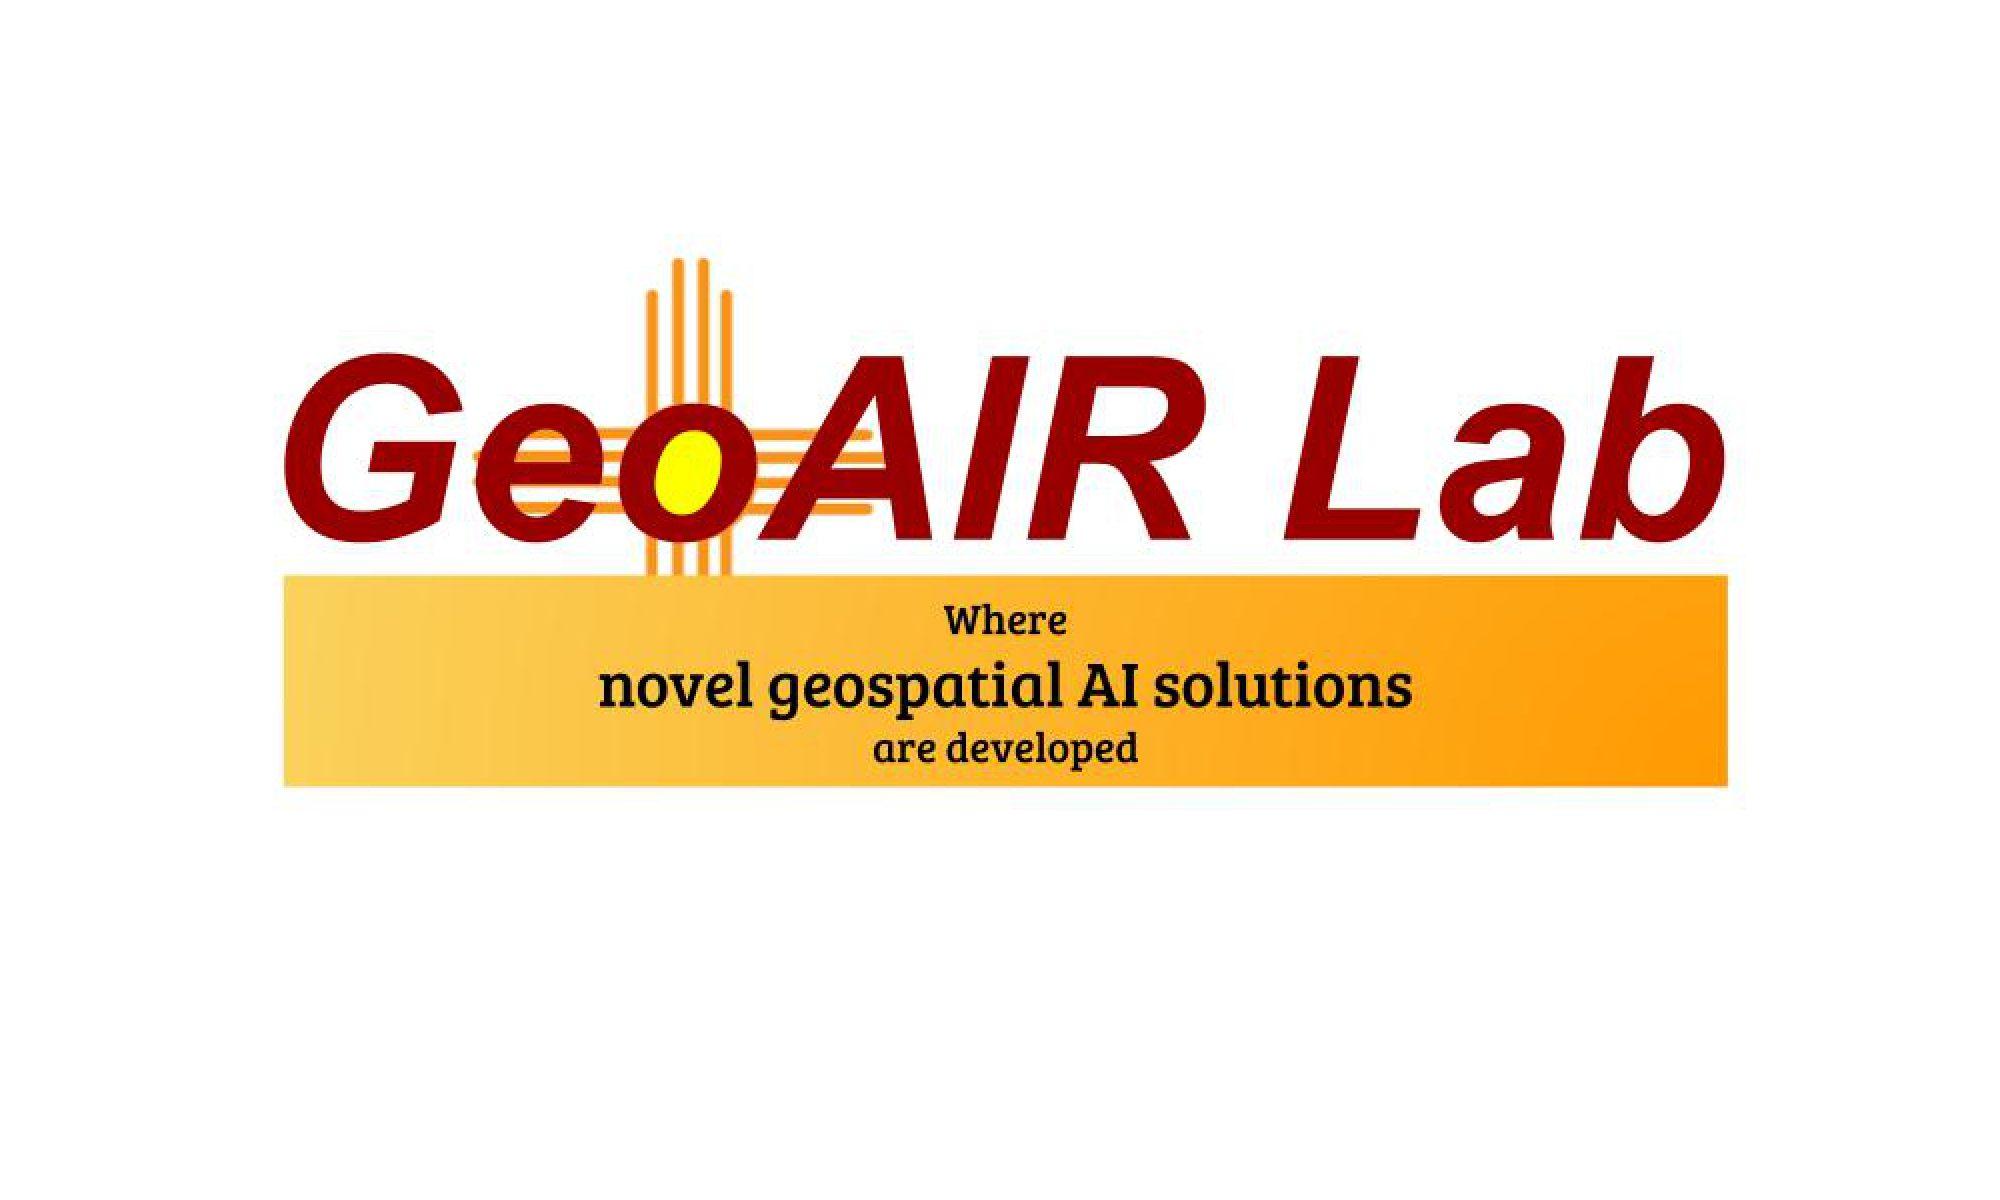 GeoAIR Lab